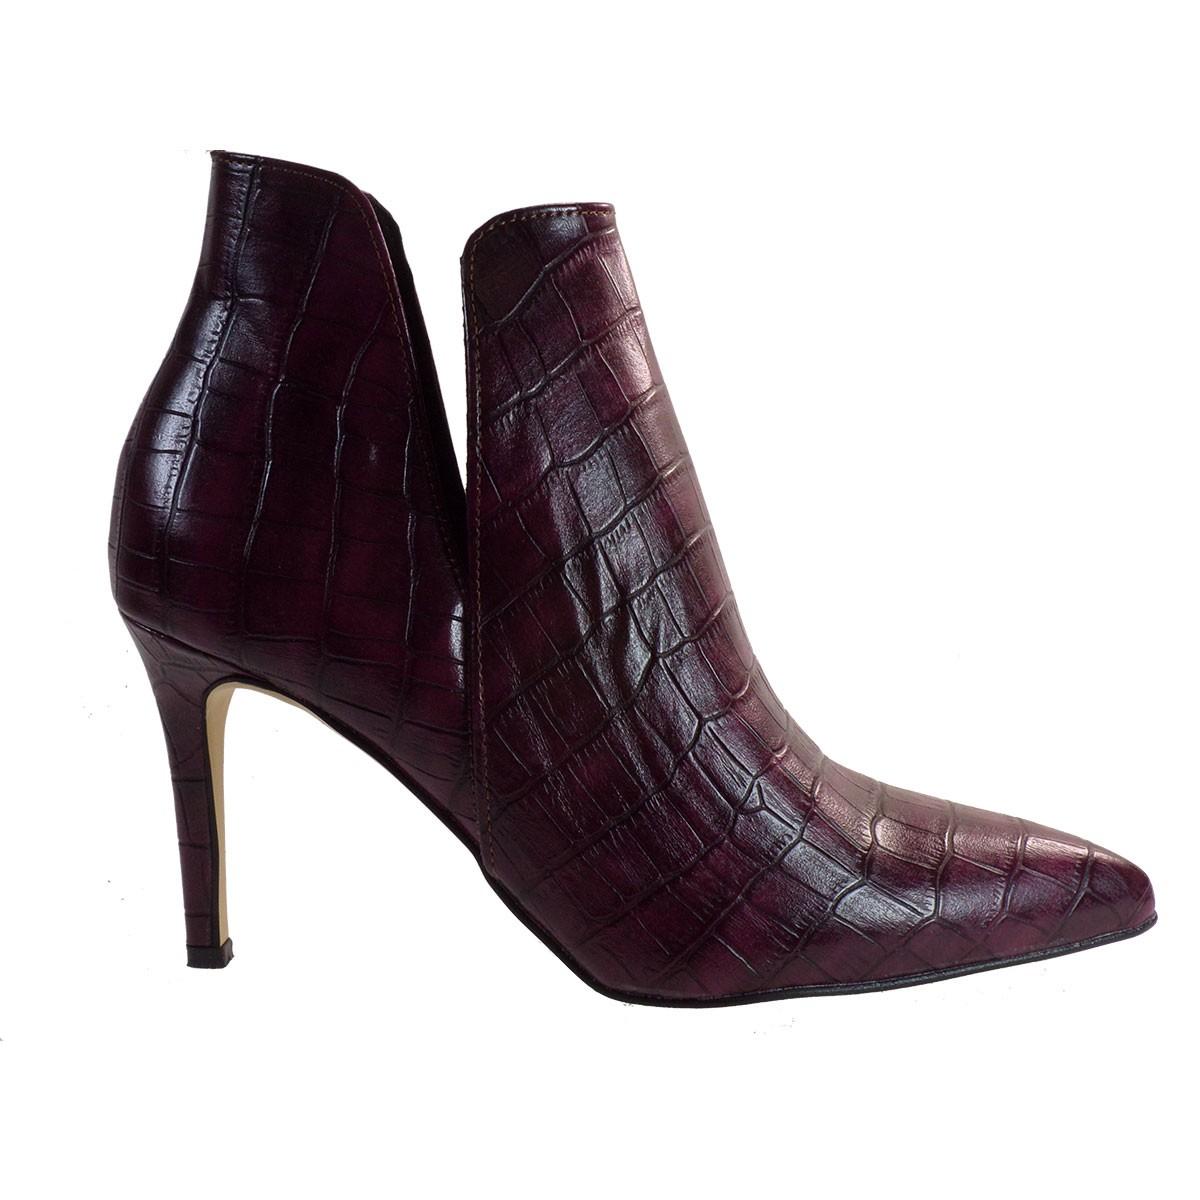 Alessandra Paggioti Γυναικεία Παπούτσια Μποτάκια 81640 Μώβ